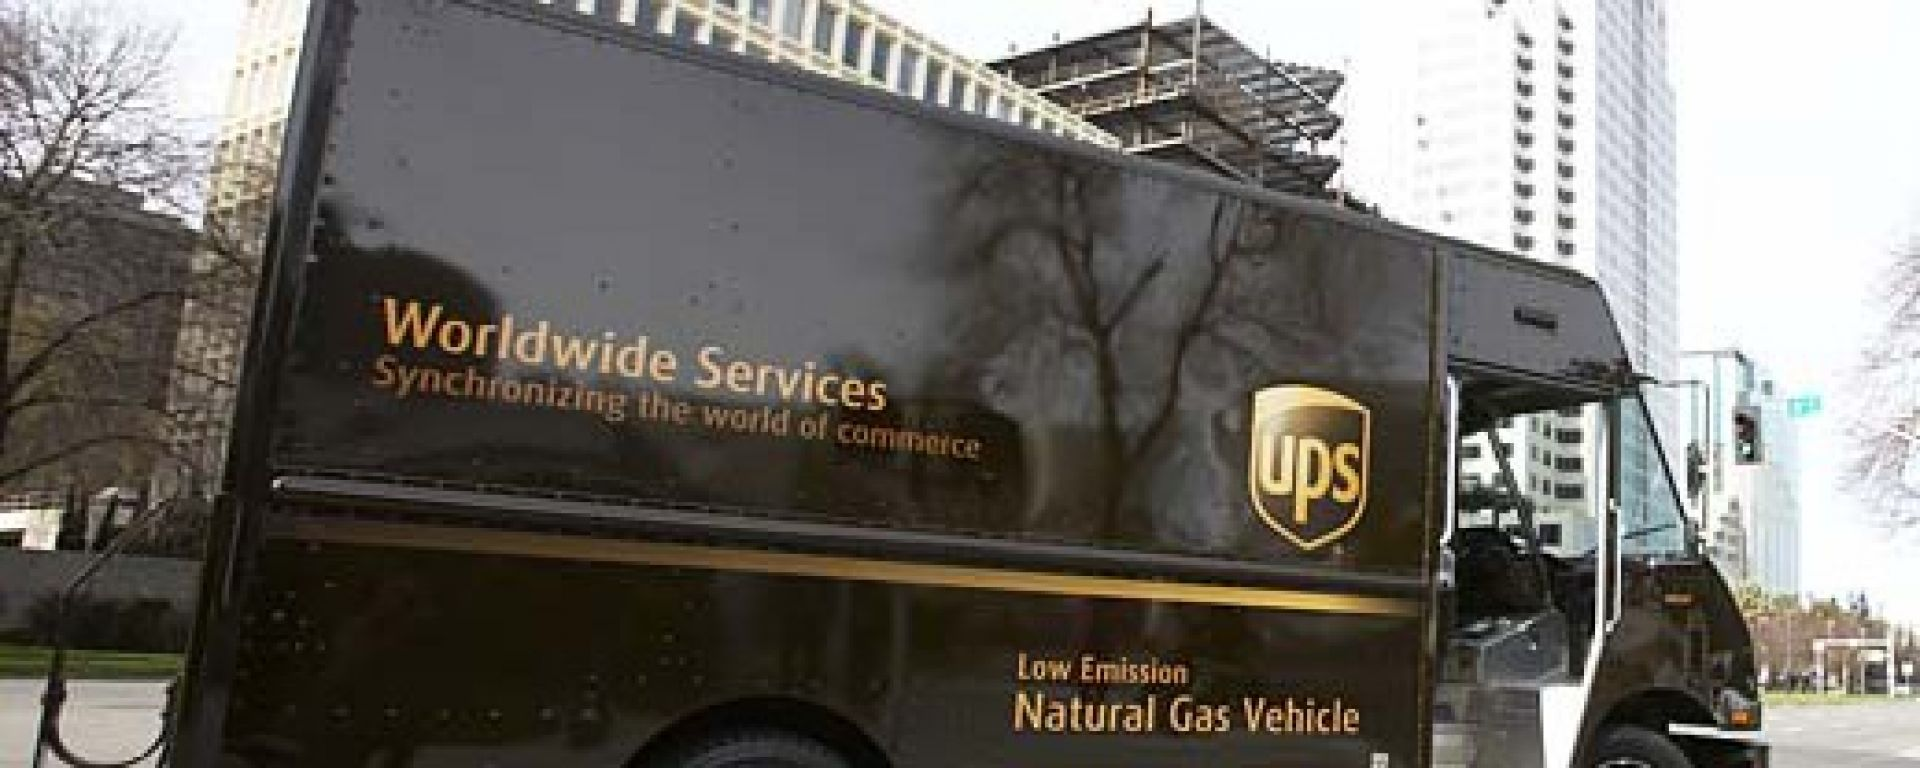 UPS Idraulic Hybrid